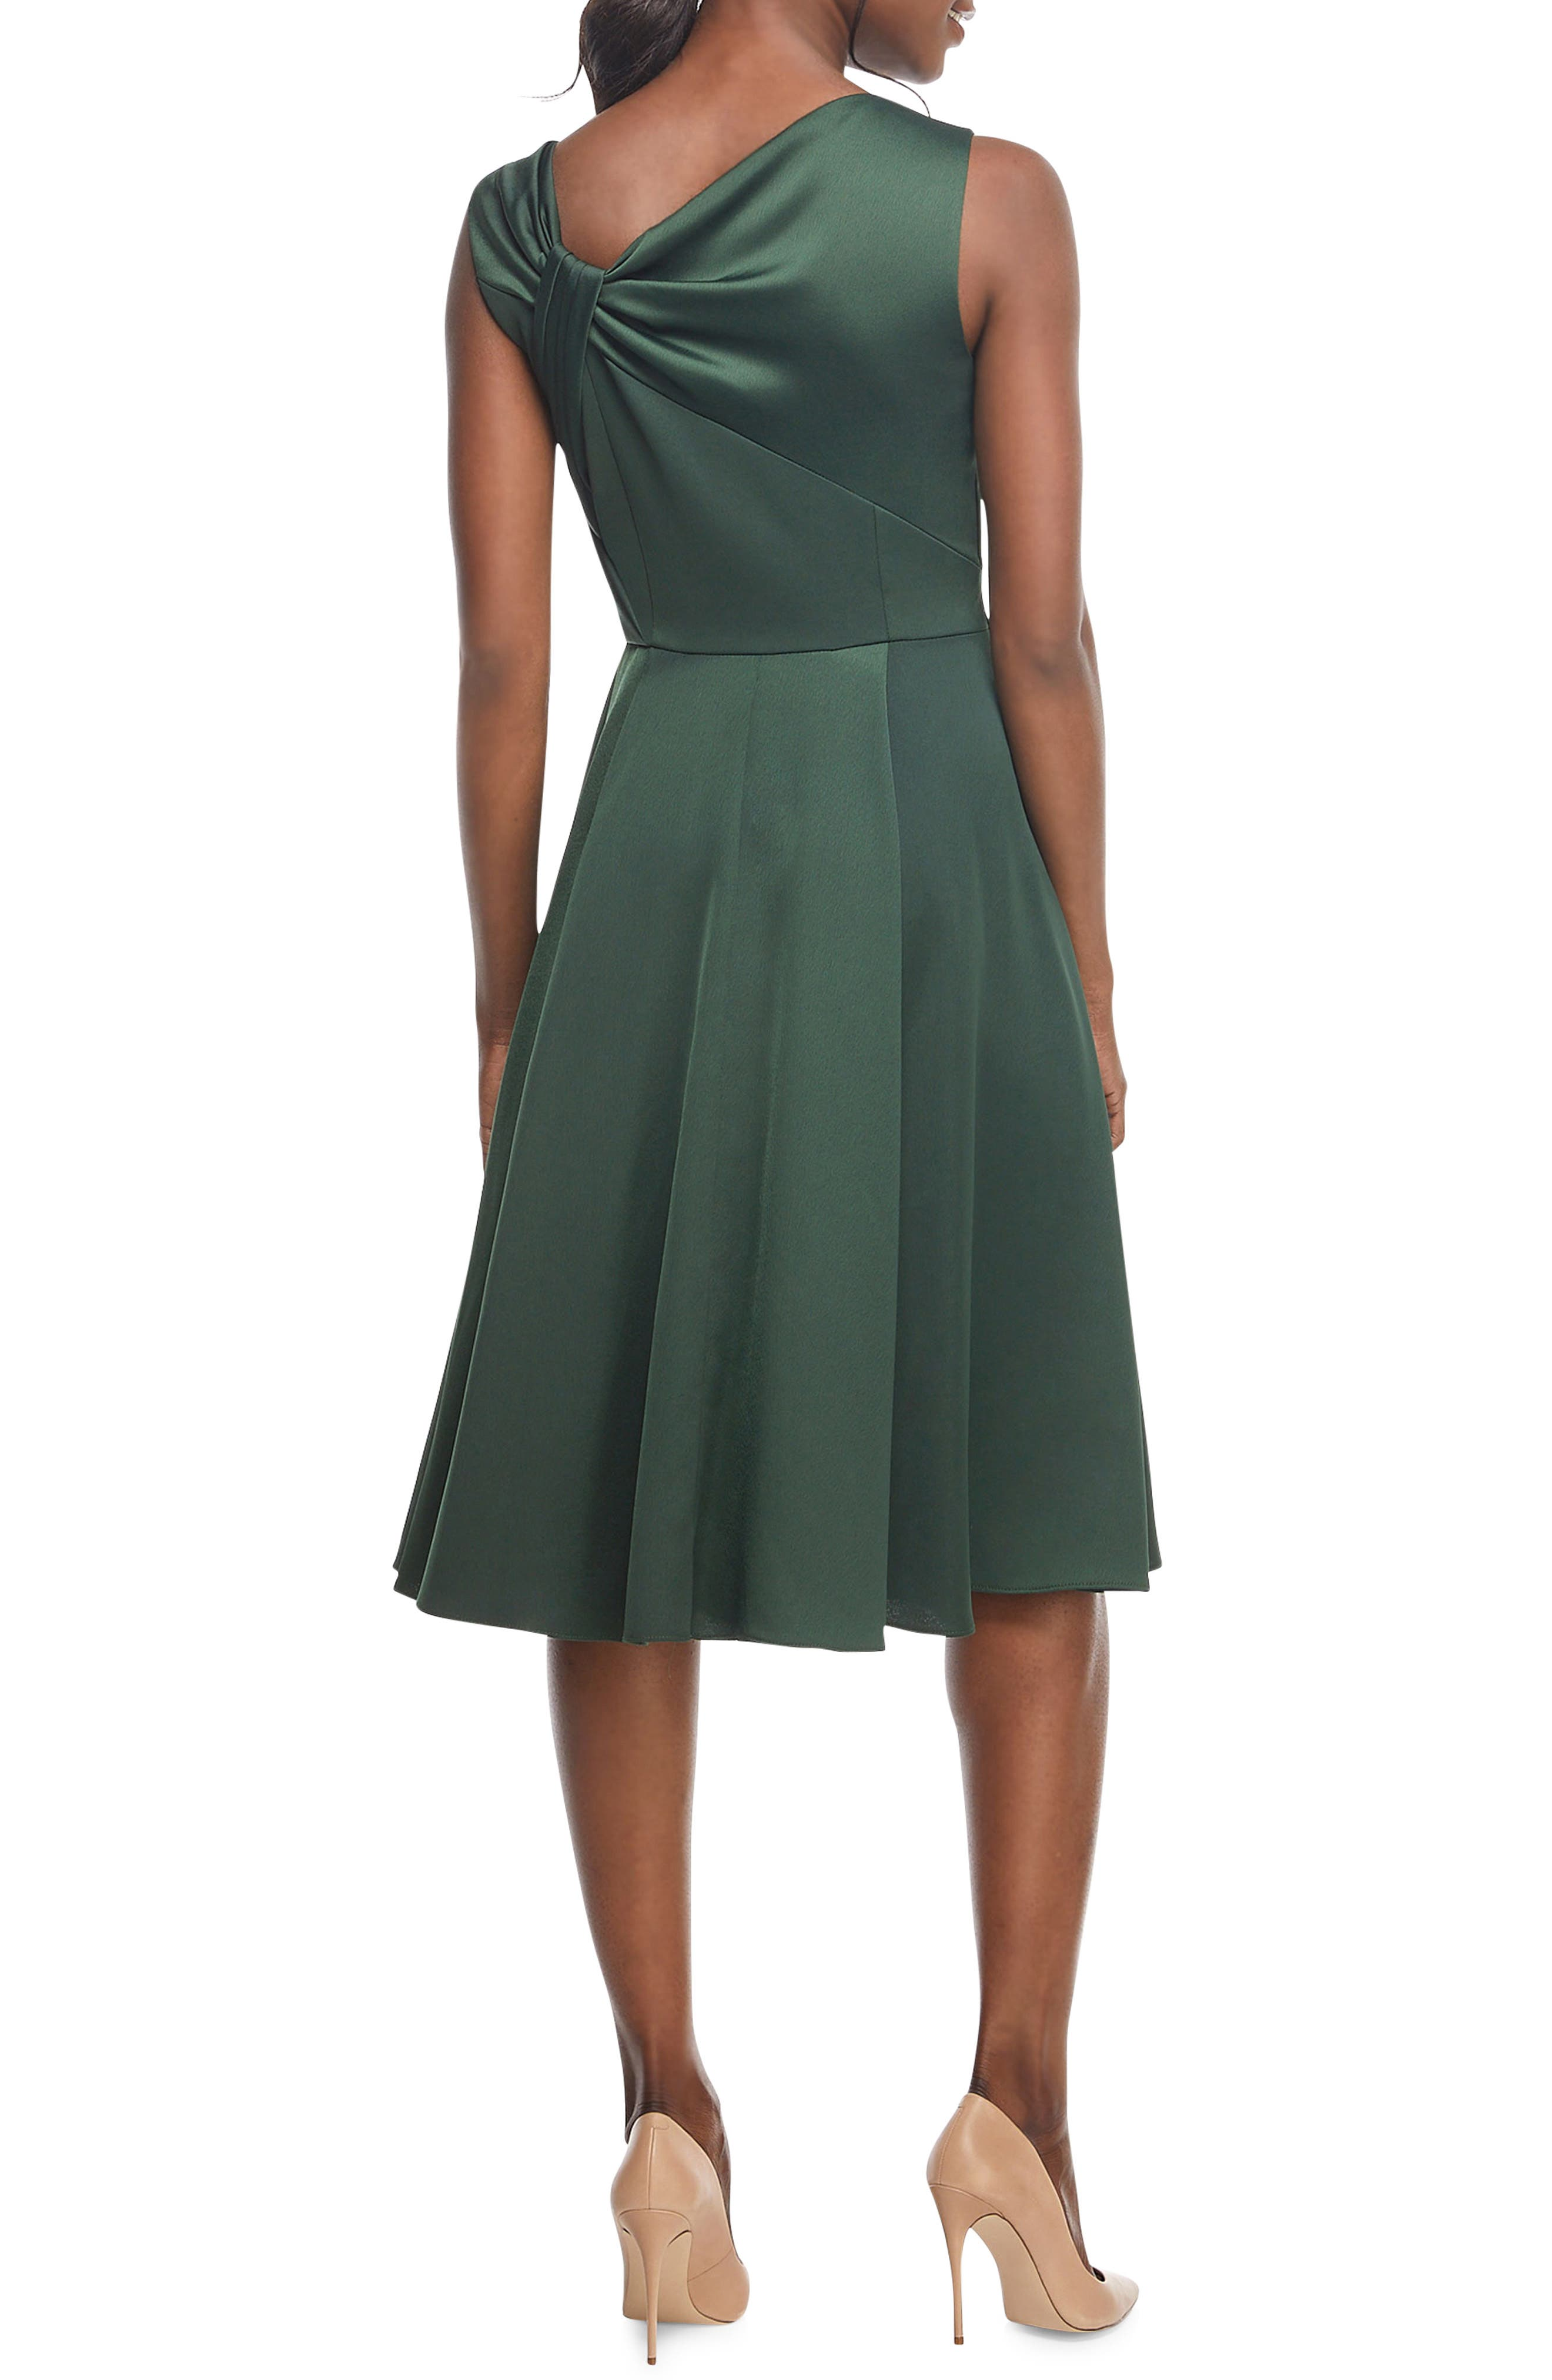 Noelle Twist Neck Satin Dress,                             Alternate thumbnail 2, color,                             306